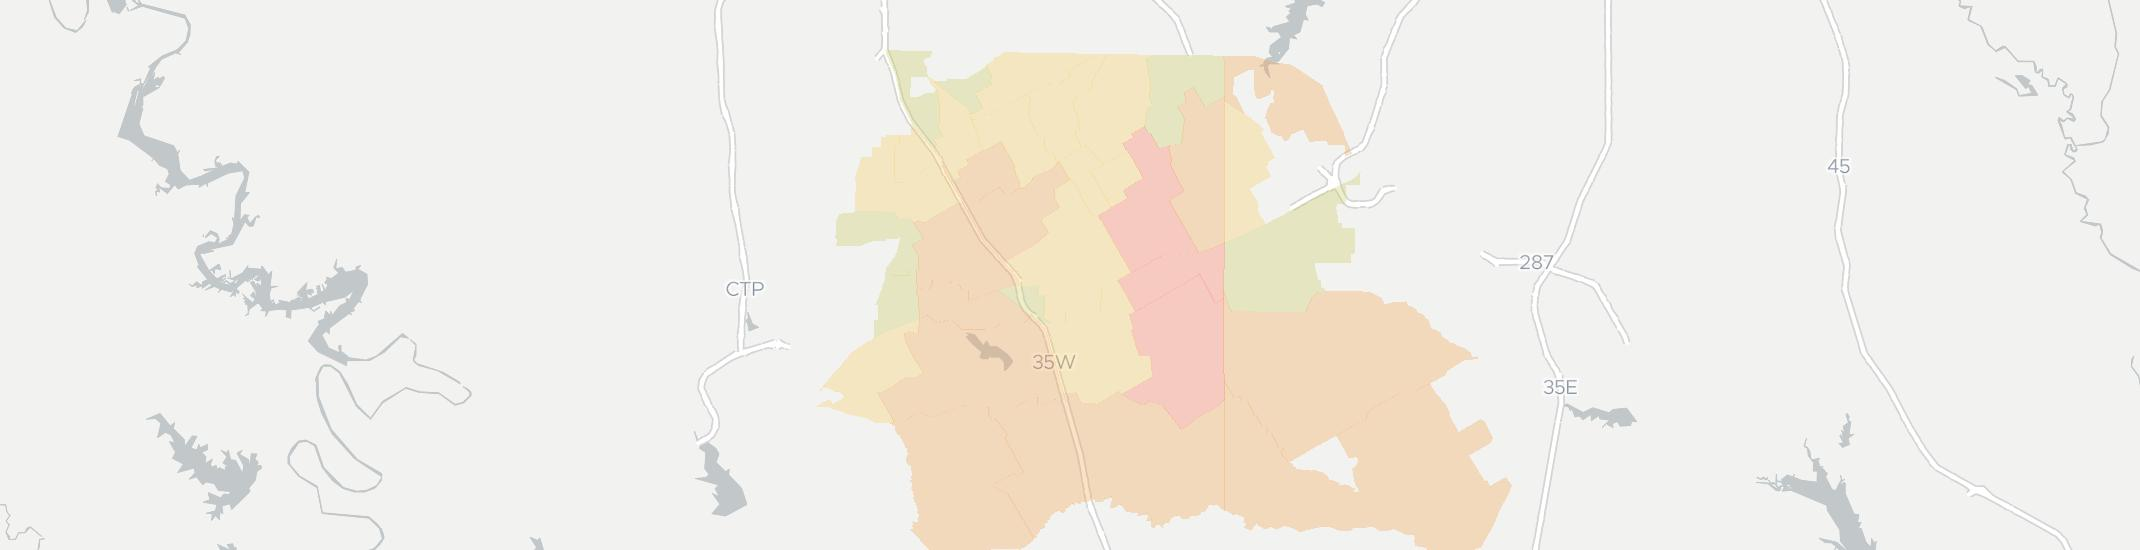 Alvarado Internet Competition Map. Click for interactive map.